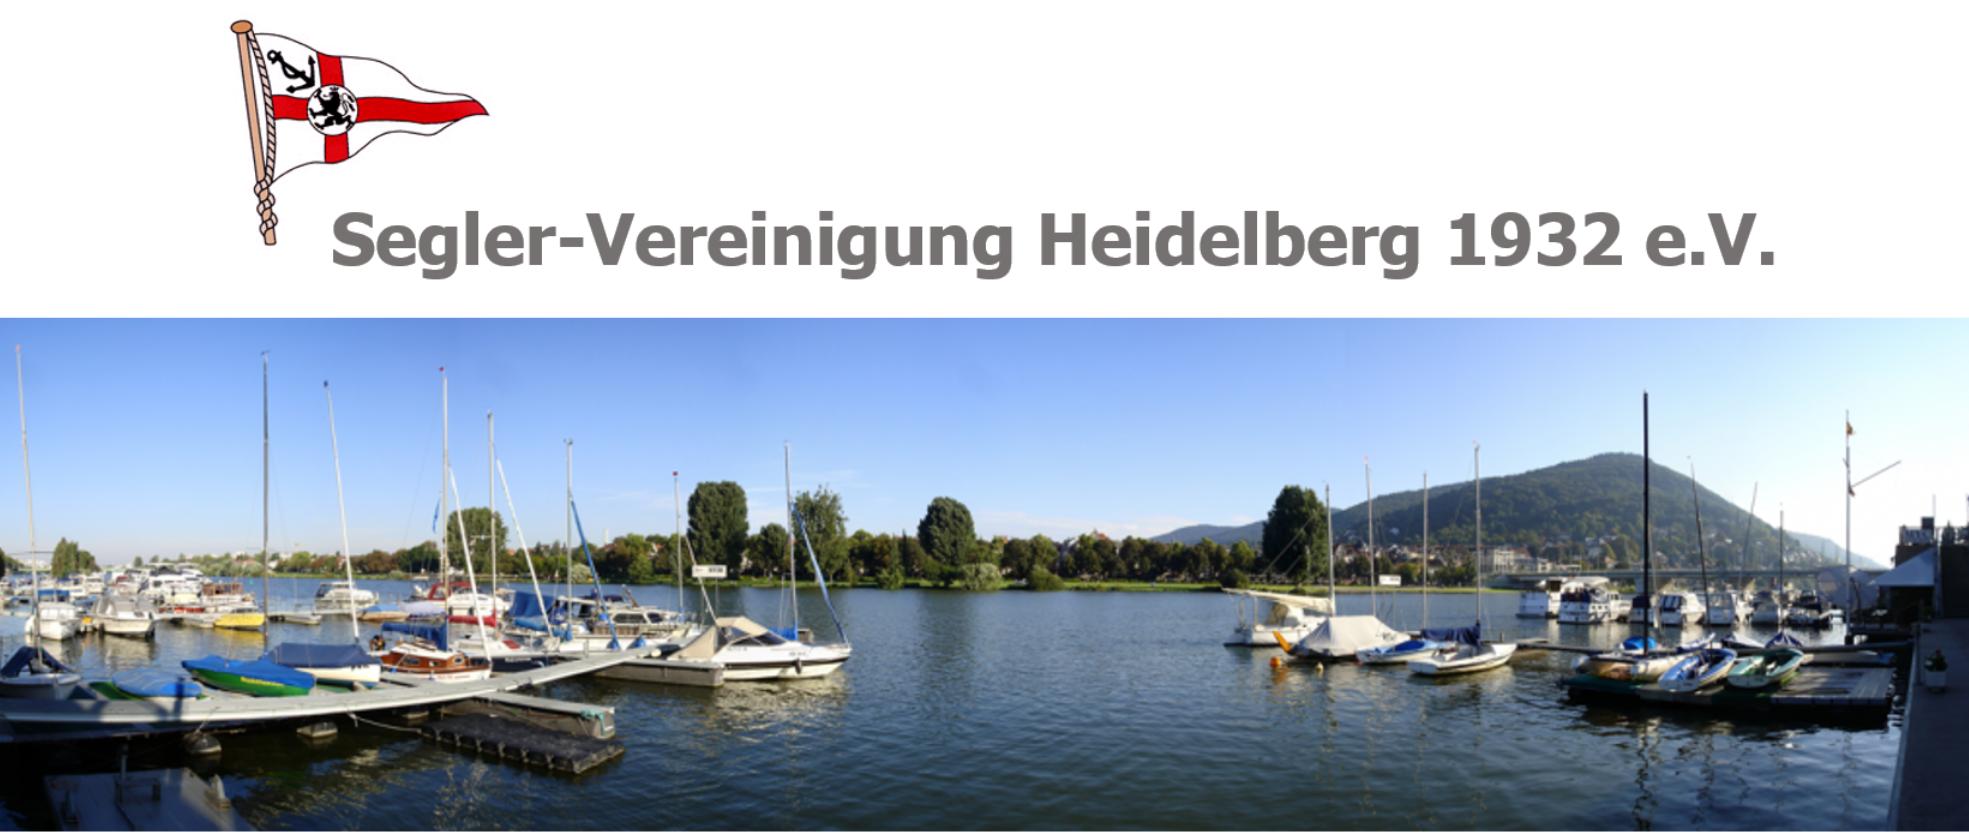 Segler-Vereinigung Heidelberg 1932 e.V. (SVH)